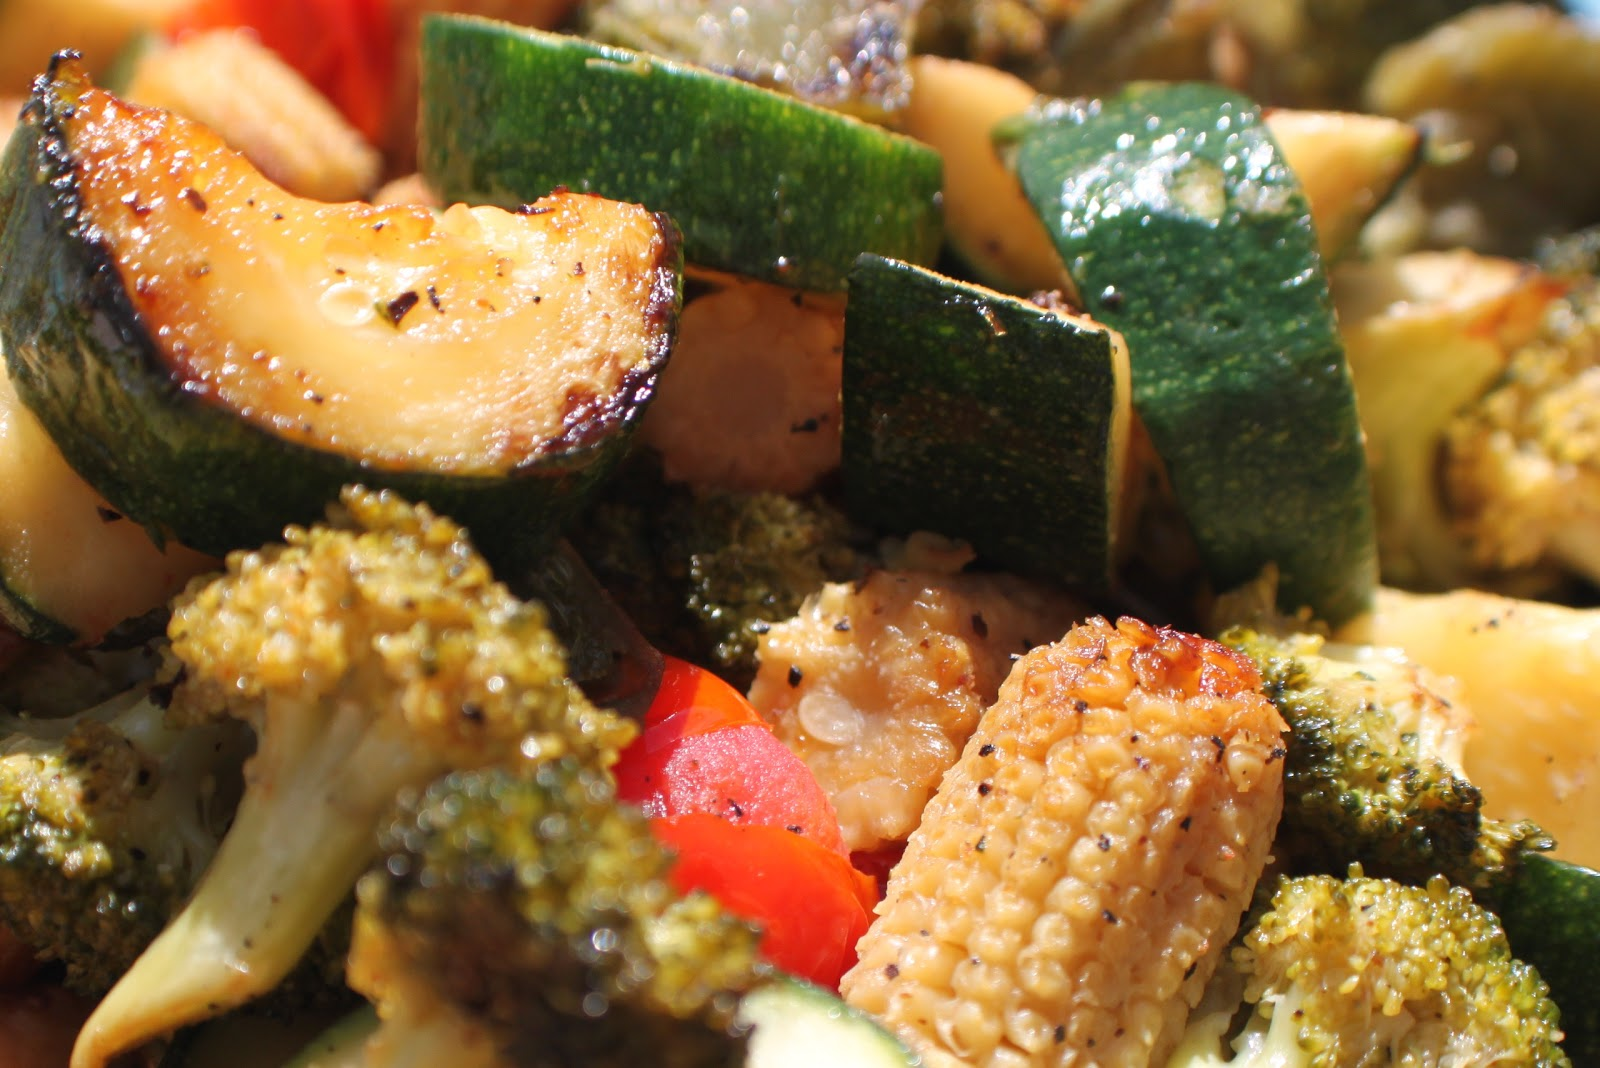 how to keep cramini mushrooms fres longer